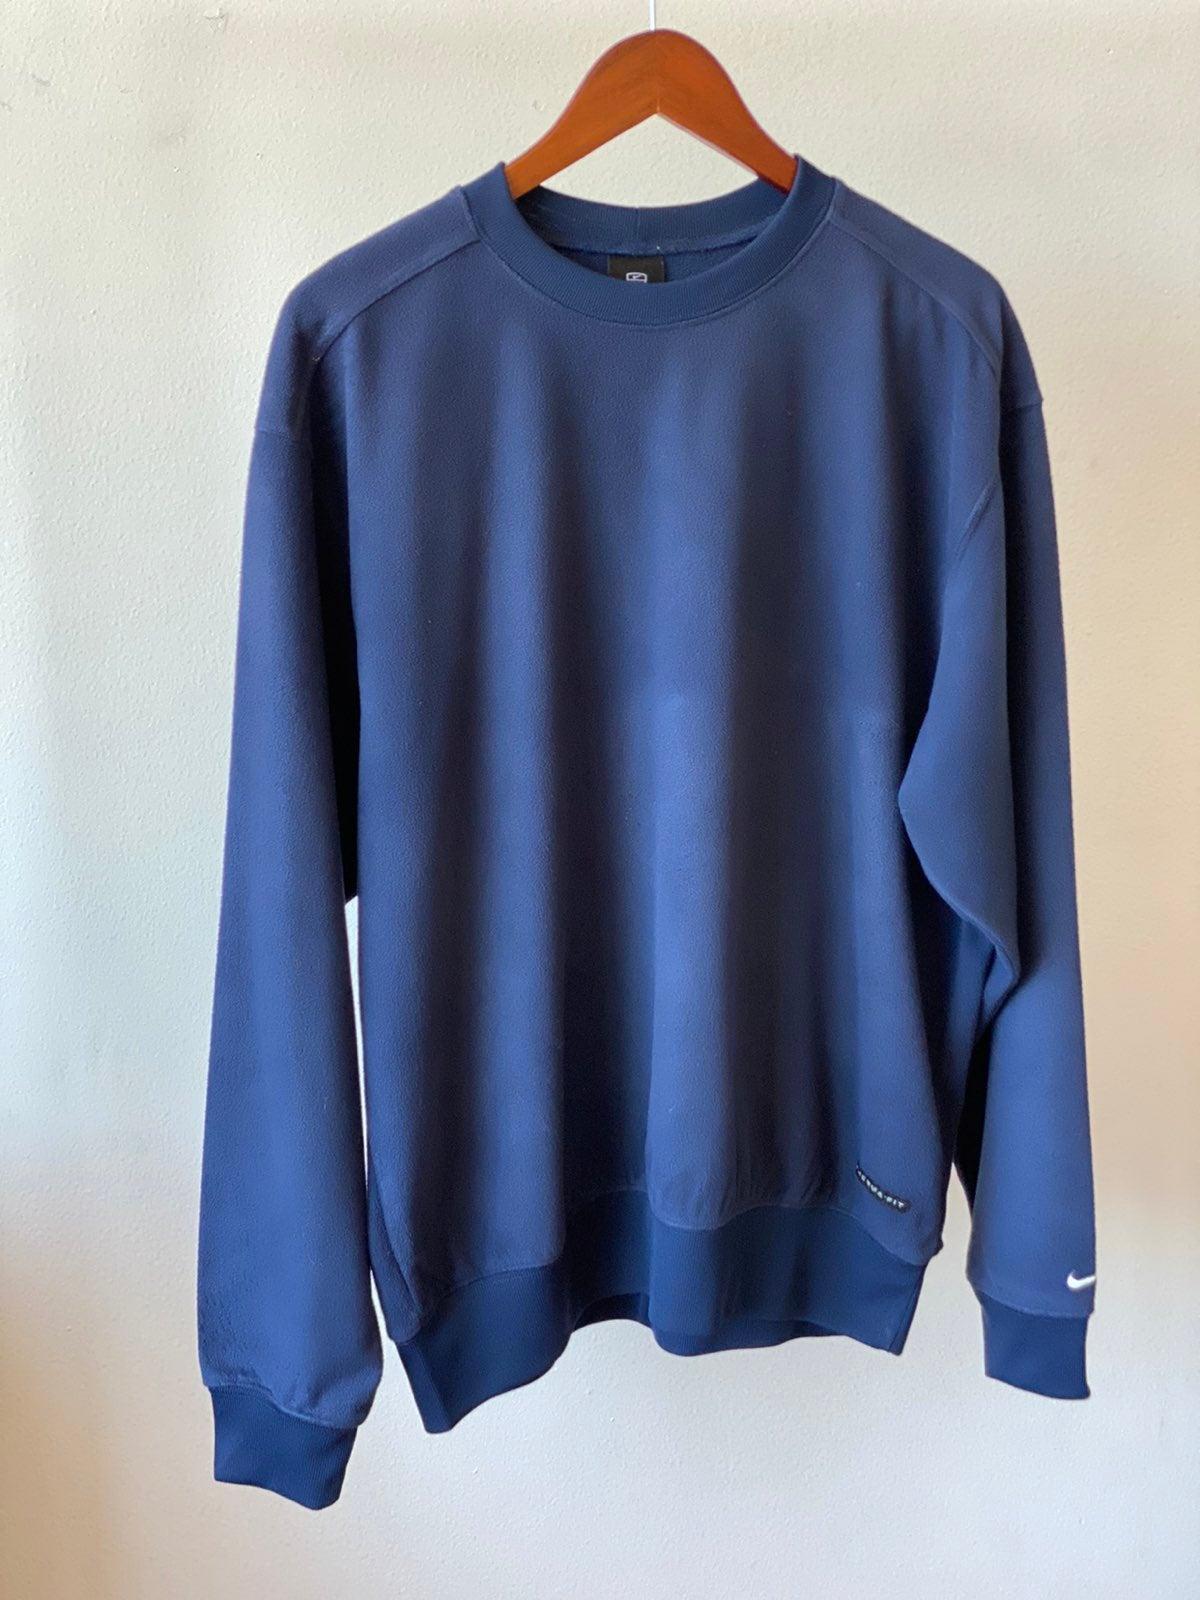 Nike Golf ThermaFIT Sweatshirt Sz M